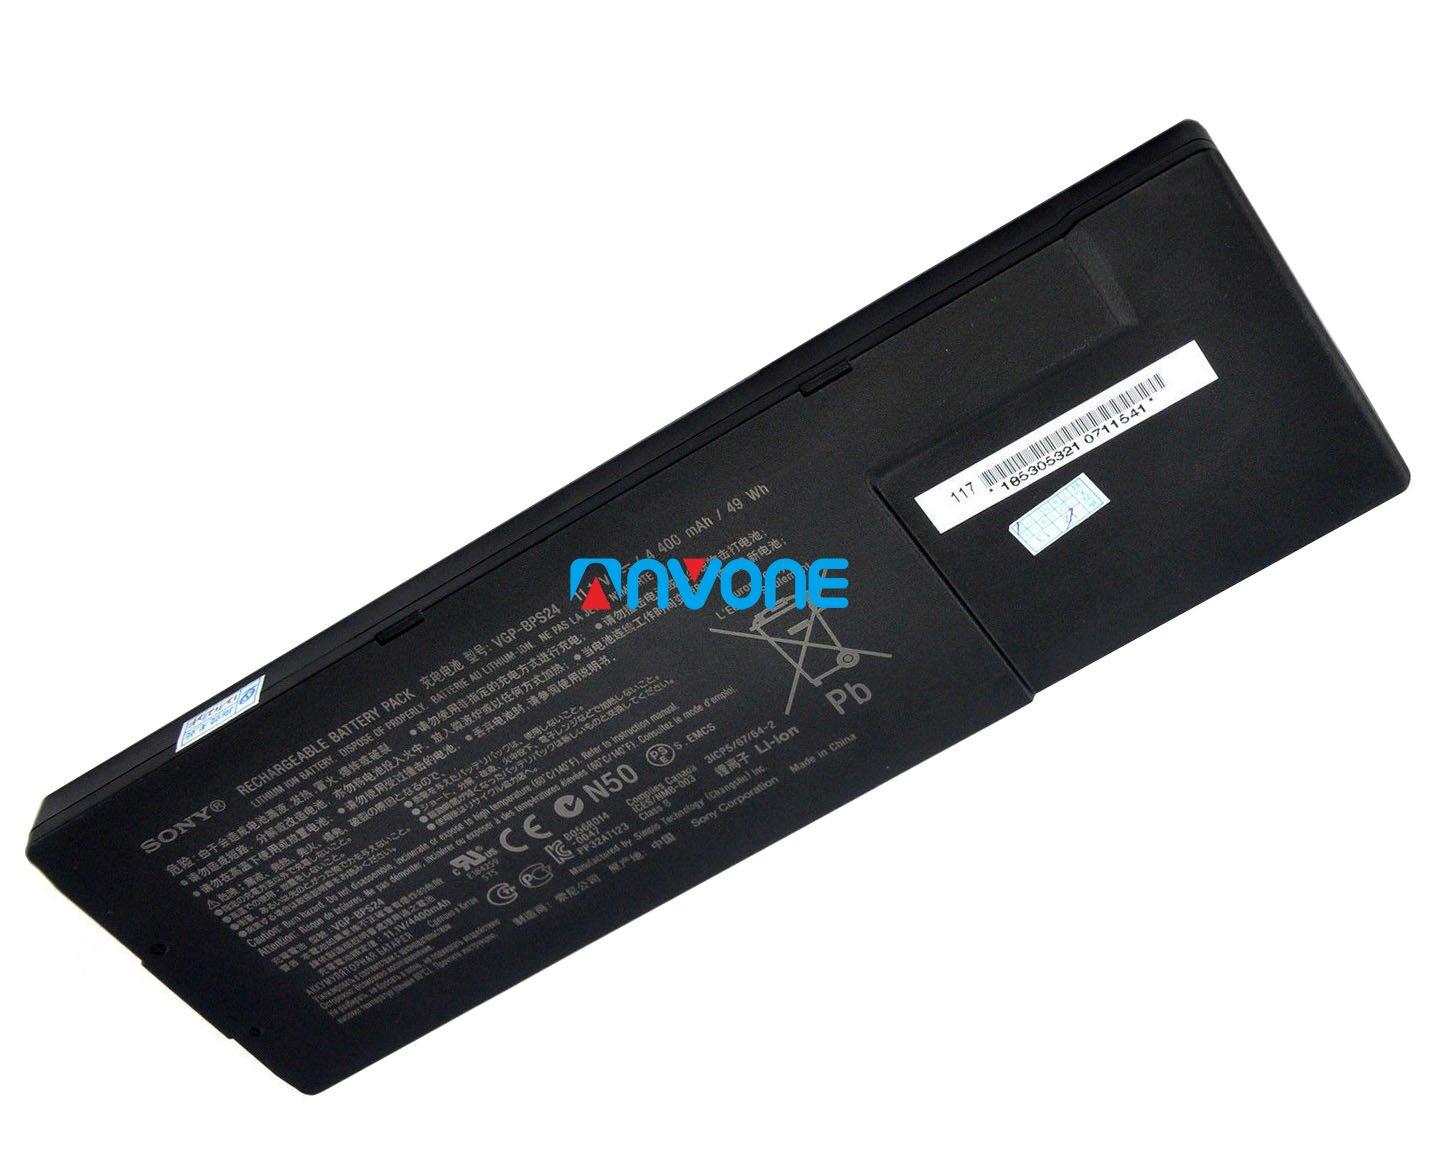 Original VGP-BPS24 Sony VAIO SVS13A25PW SVS13A25PW/B SVS13A26PG SVS13A26PGB Battery